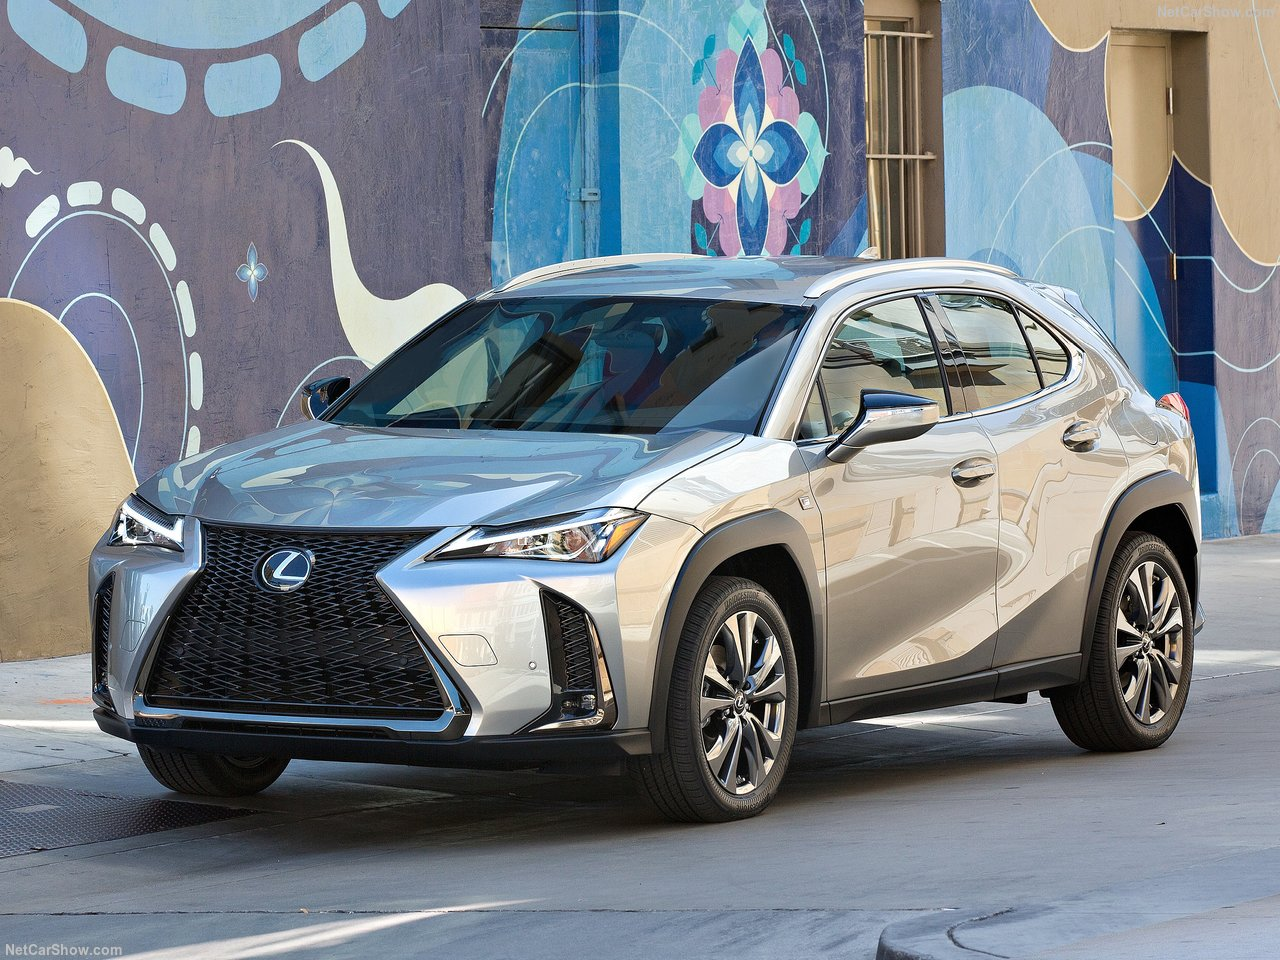 Lexus-UX-2019-1280-06_2018081910194317d.jpg